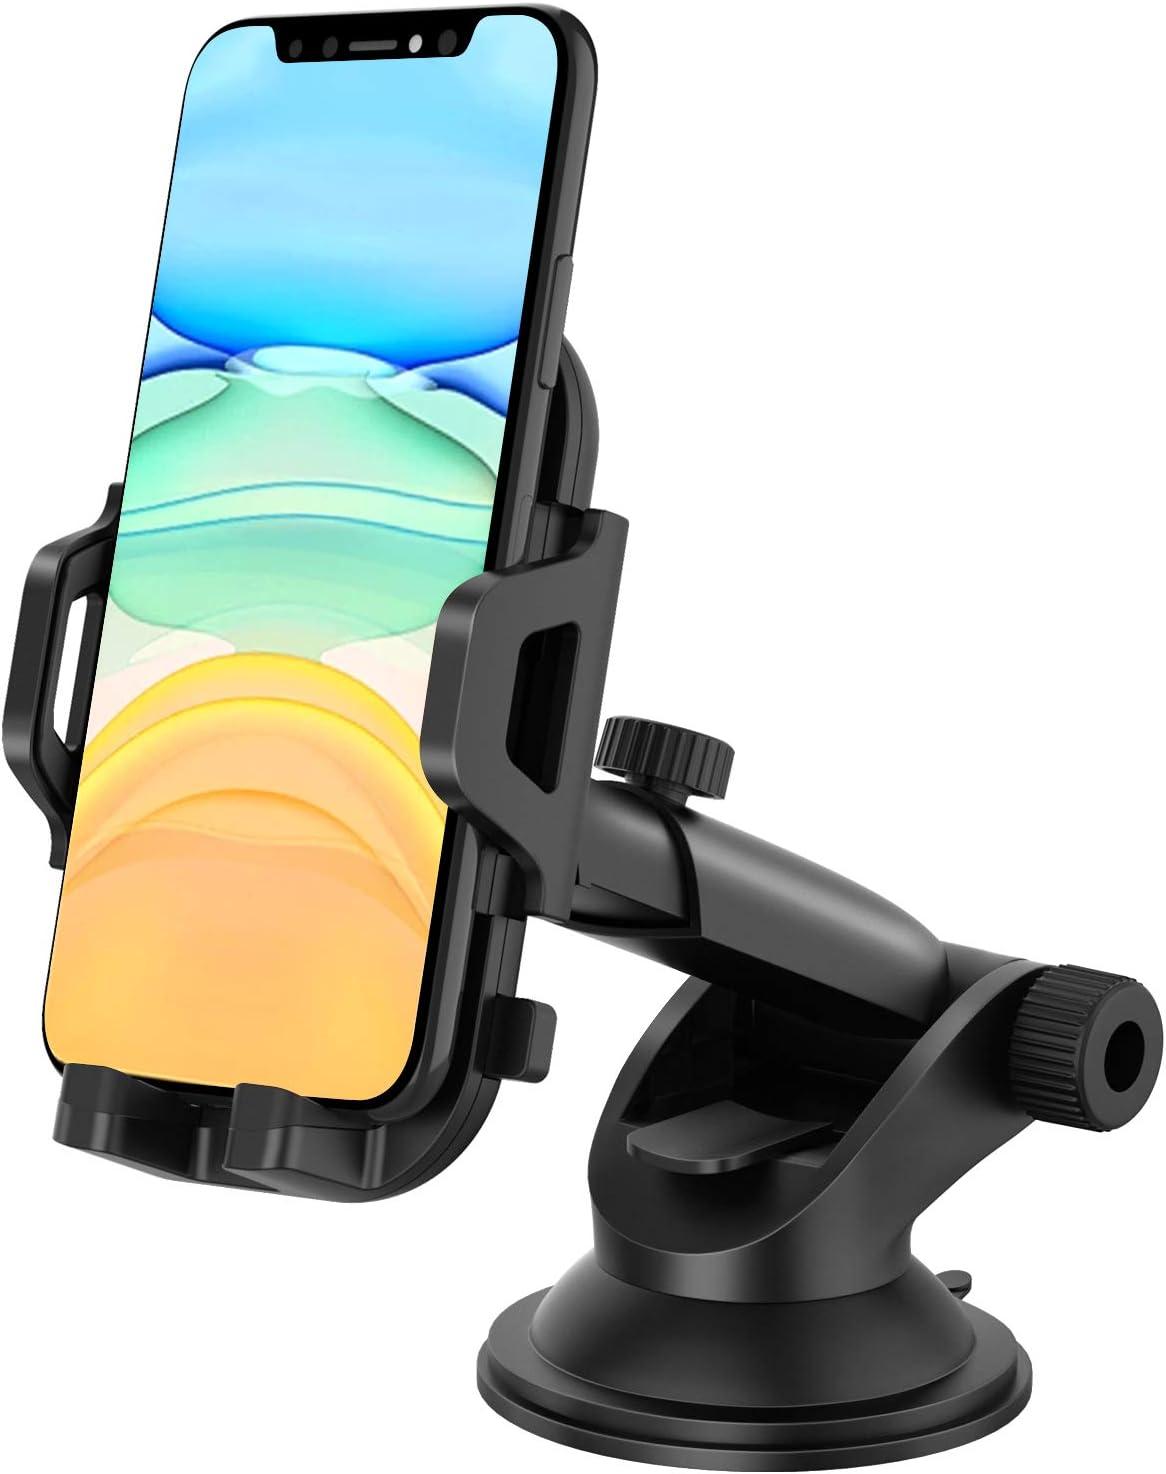 MOSOTECH Soporte Móvil para Coche, Rotación de 360 ° Universal Porta Movil Coche Ventosa para Tablero de Instrumentos/Parabrisas para iPhone 11/11 Pro /11 Pro MAX/XS MAX, Samsung Note 10/S10e, Huawei